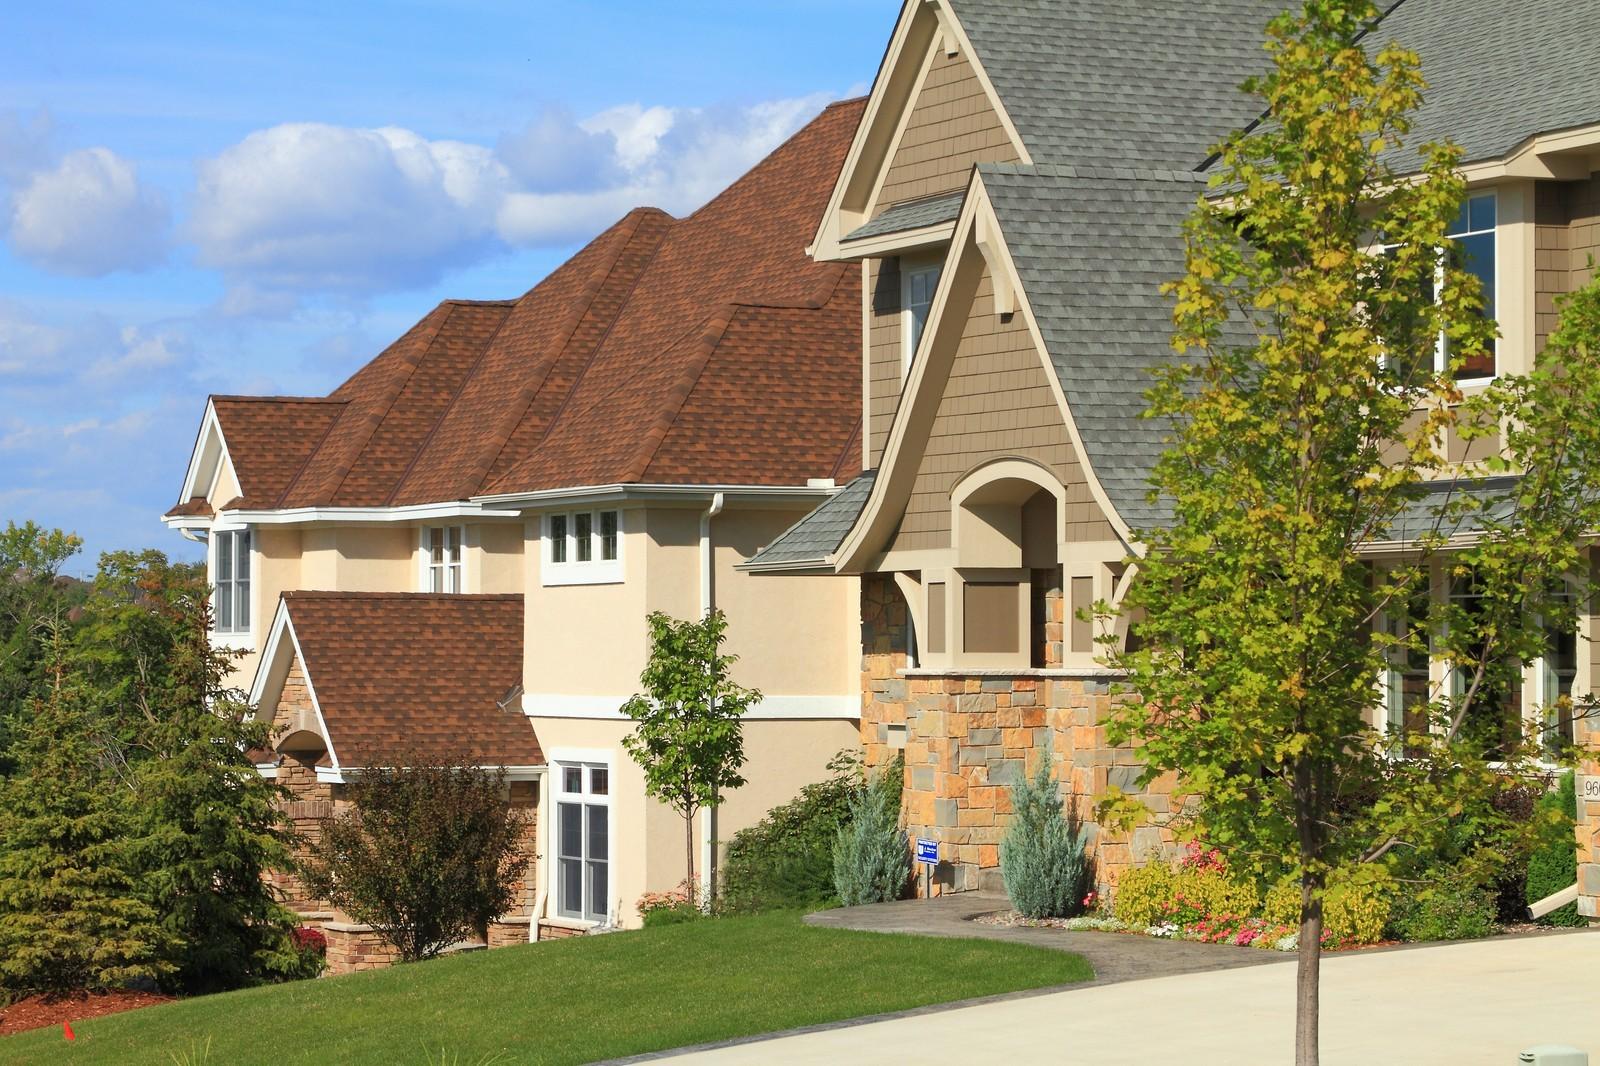 Real Estate Photography - 9627 Sky Lane, Eden Prairie, MN, 55347 - Location 6